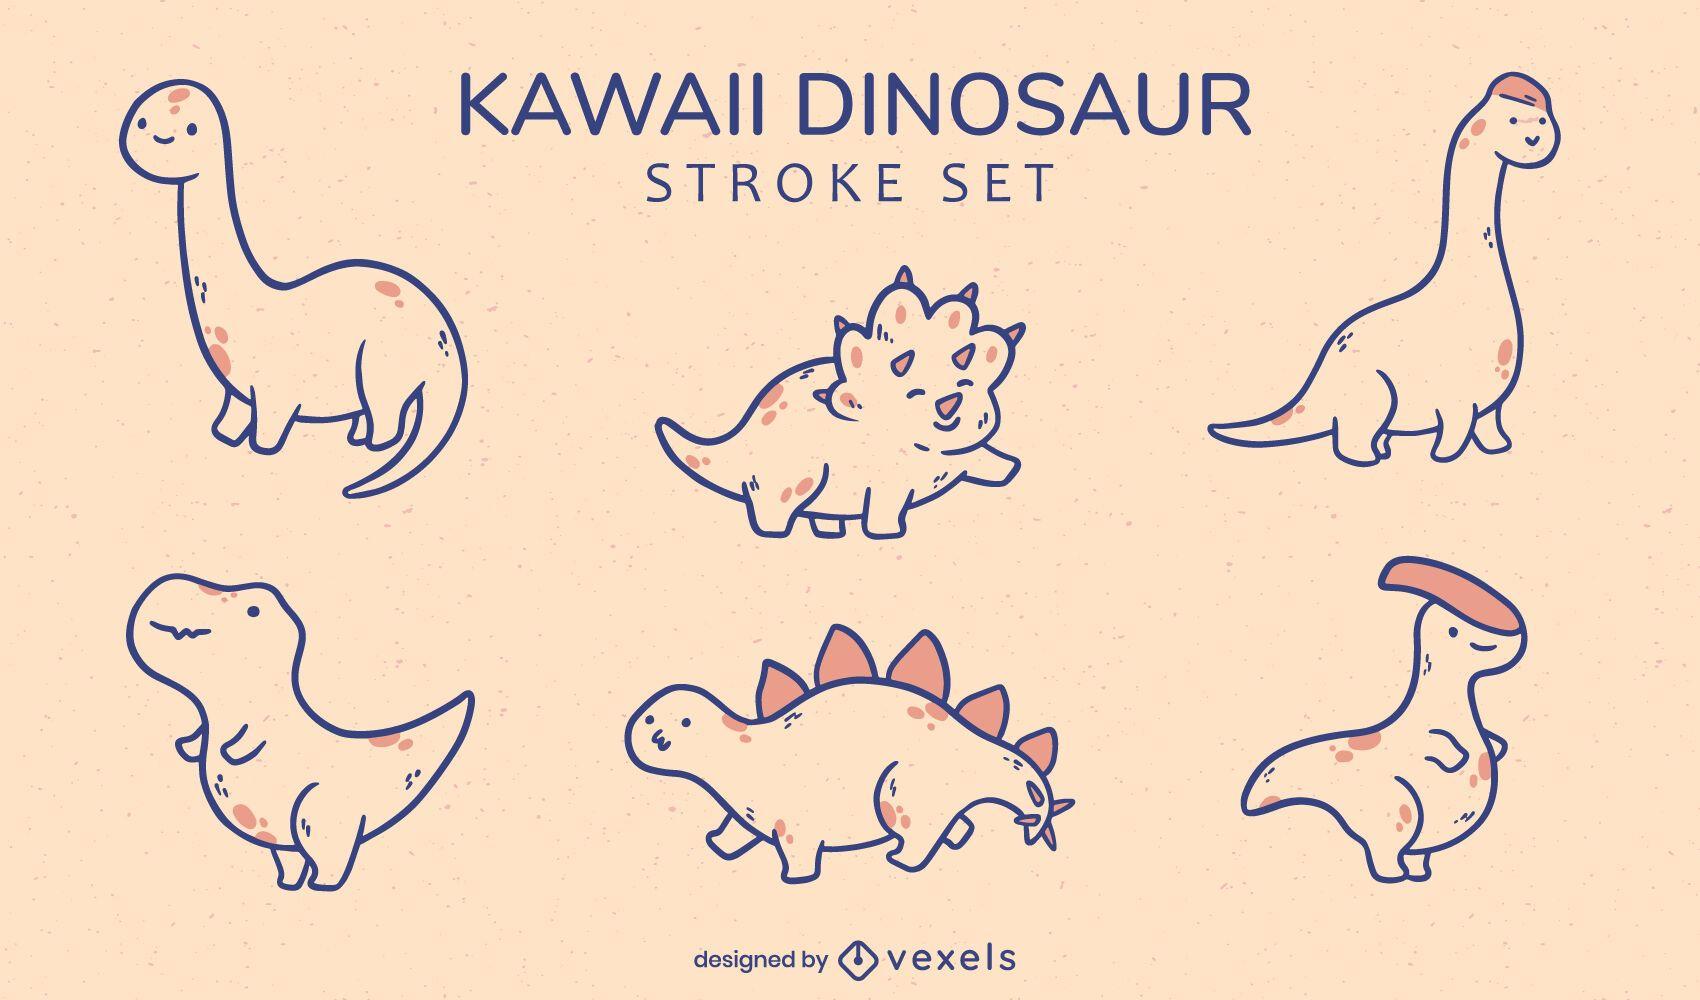 Kawaii dinosaurs animal species set